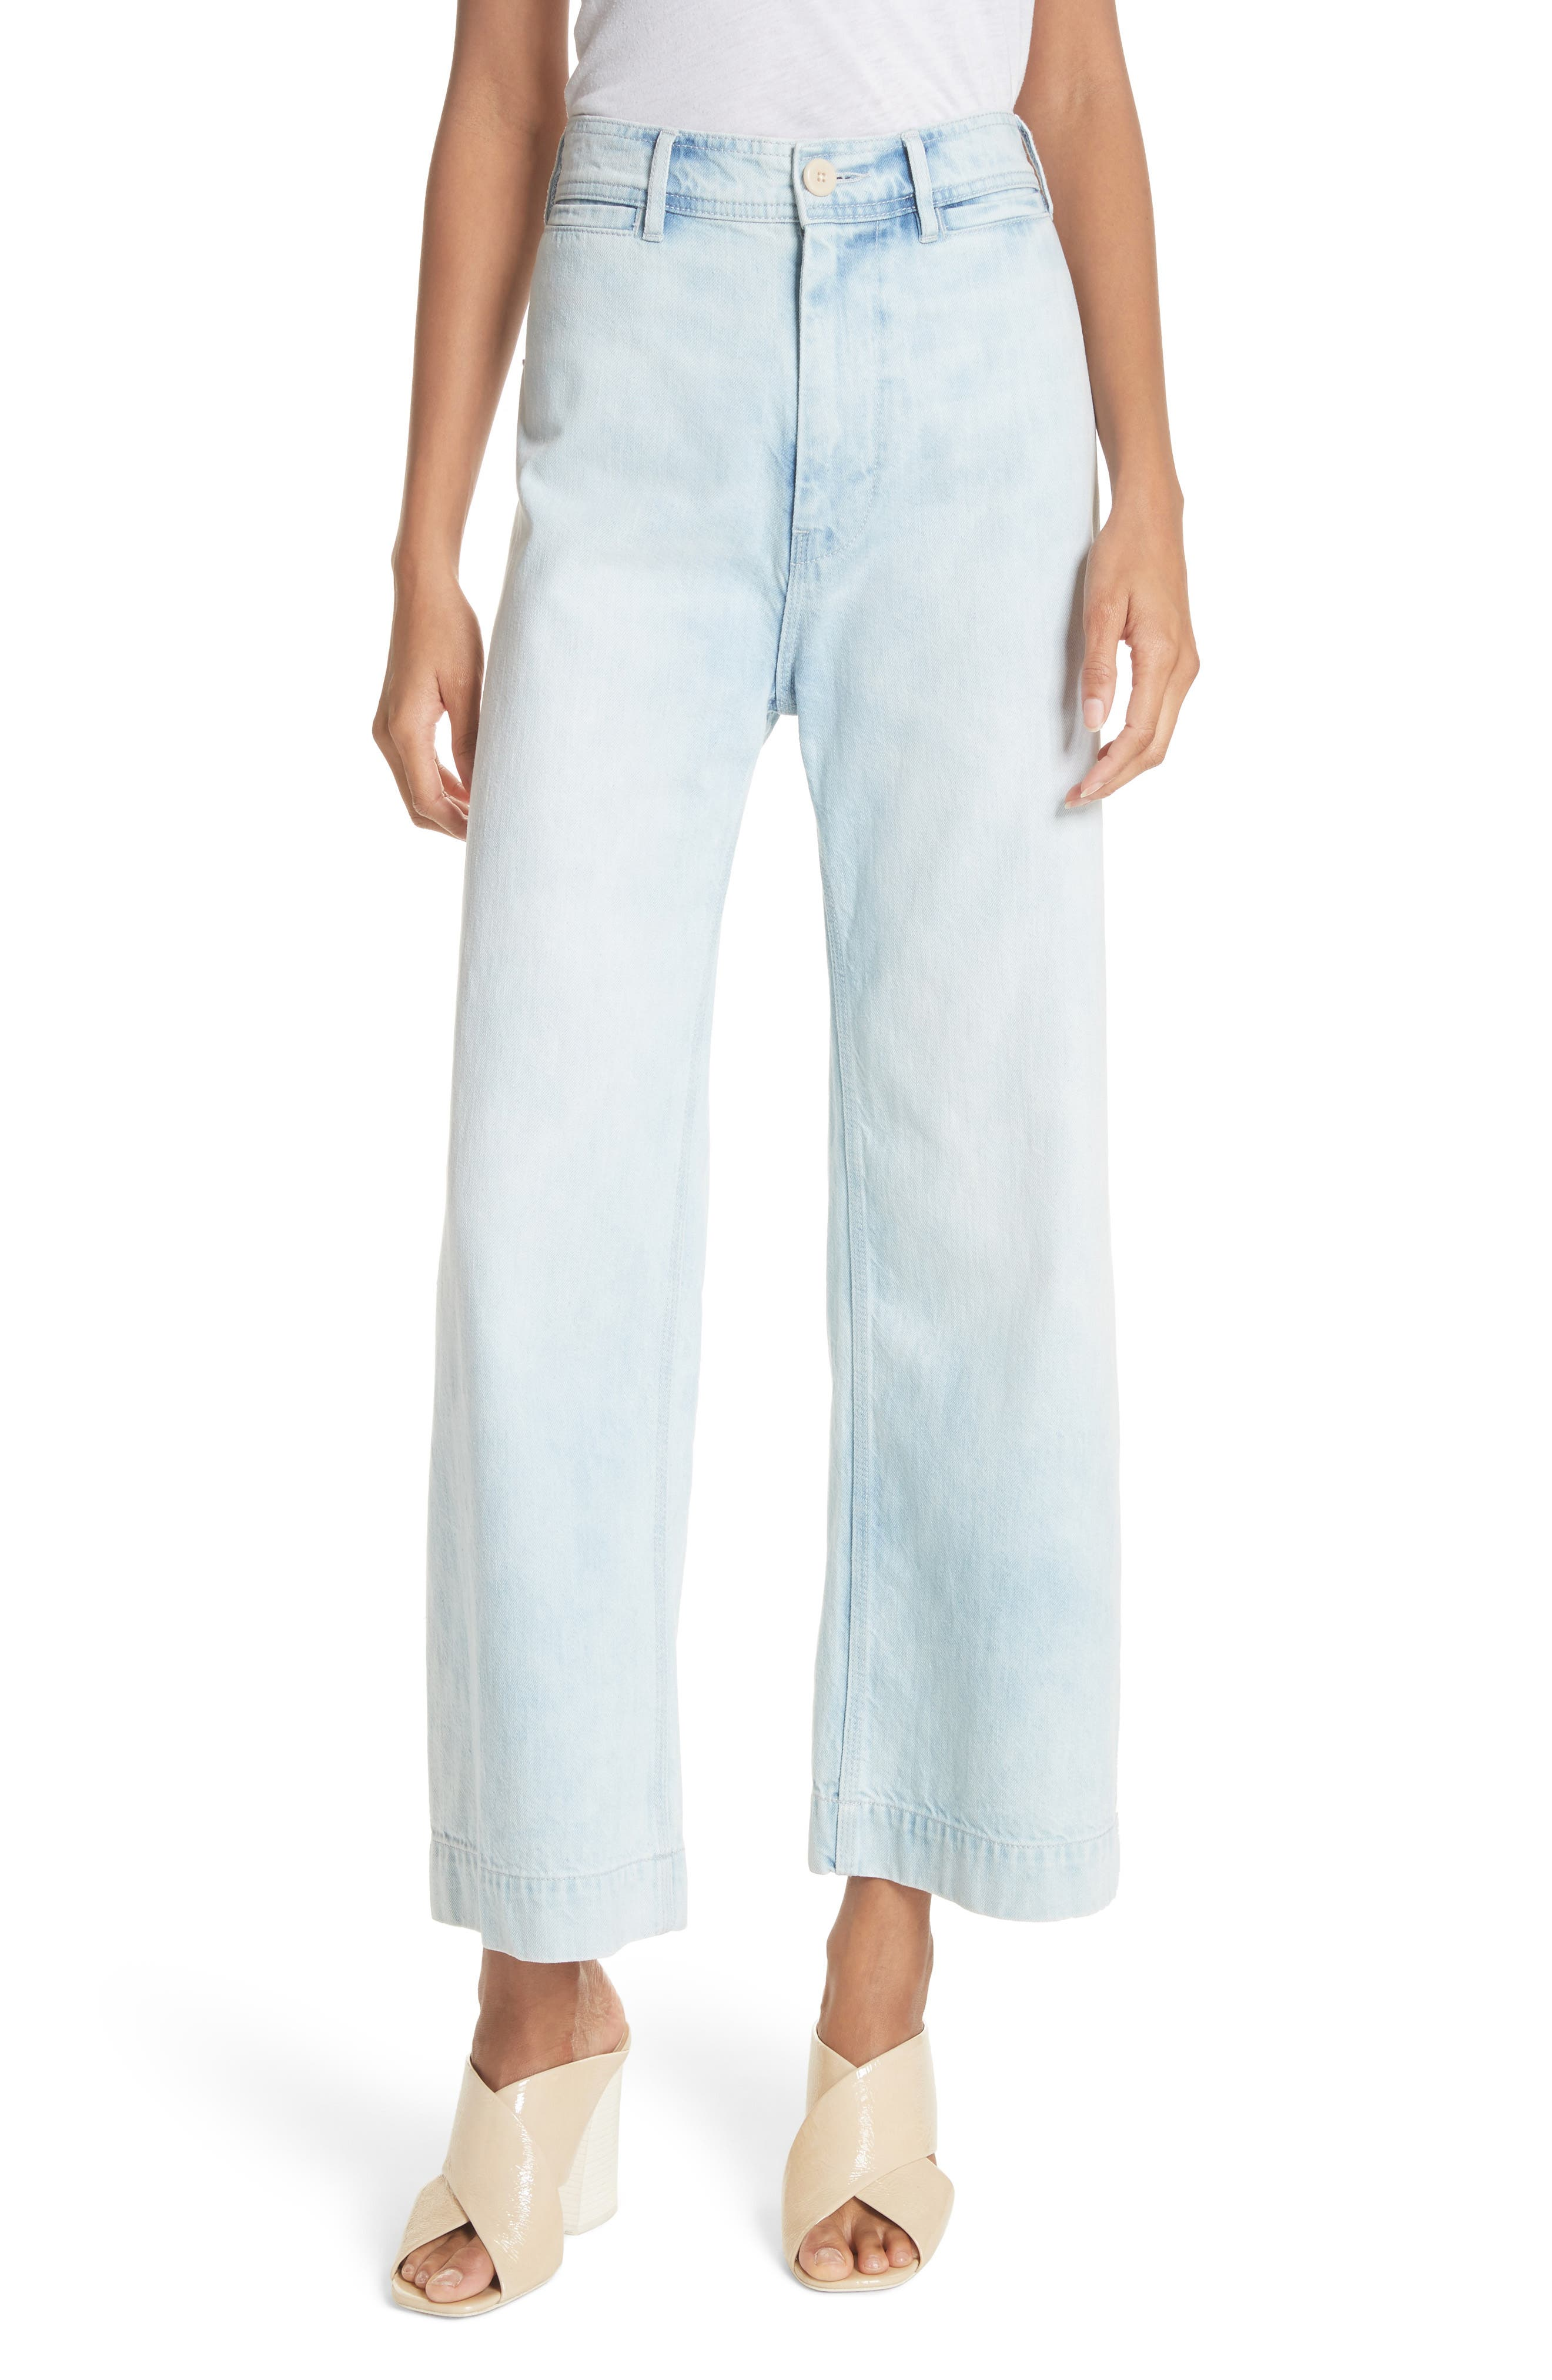 La Vie Rebecca Taylor Crop Wide Leg Jeans (Nuage Wash)